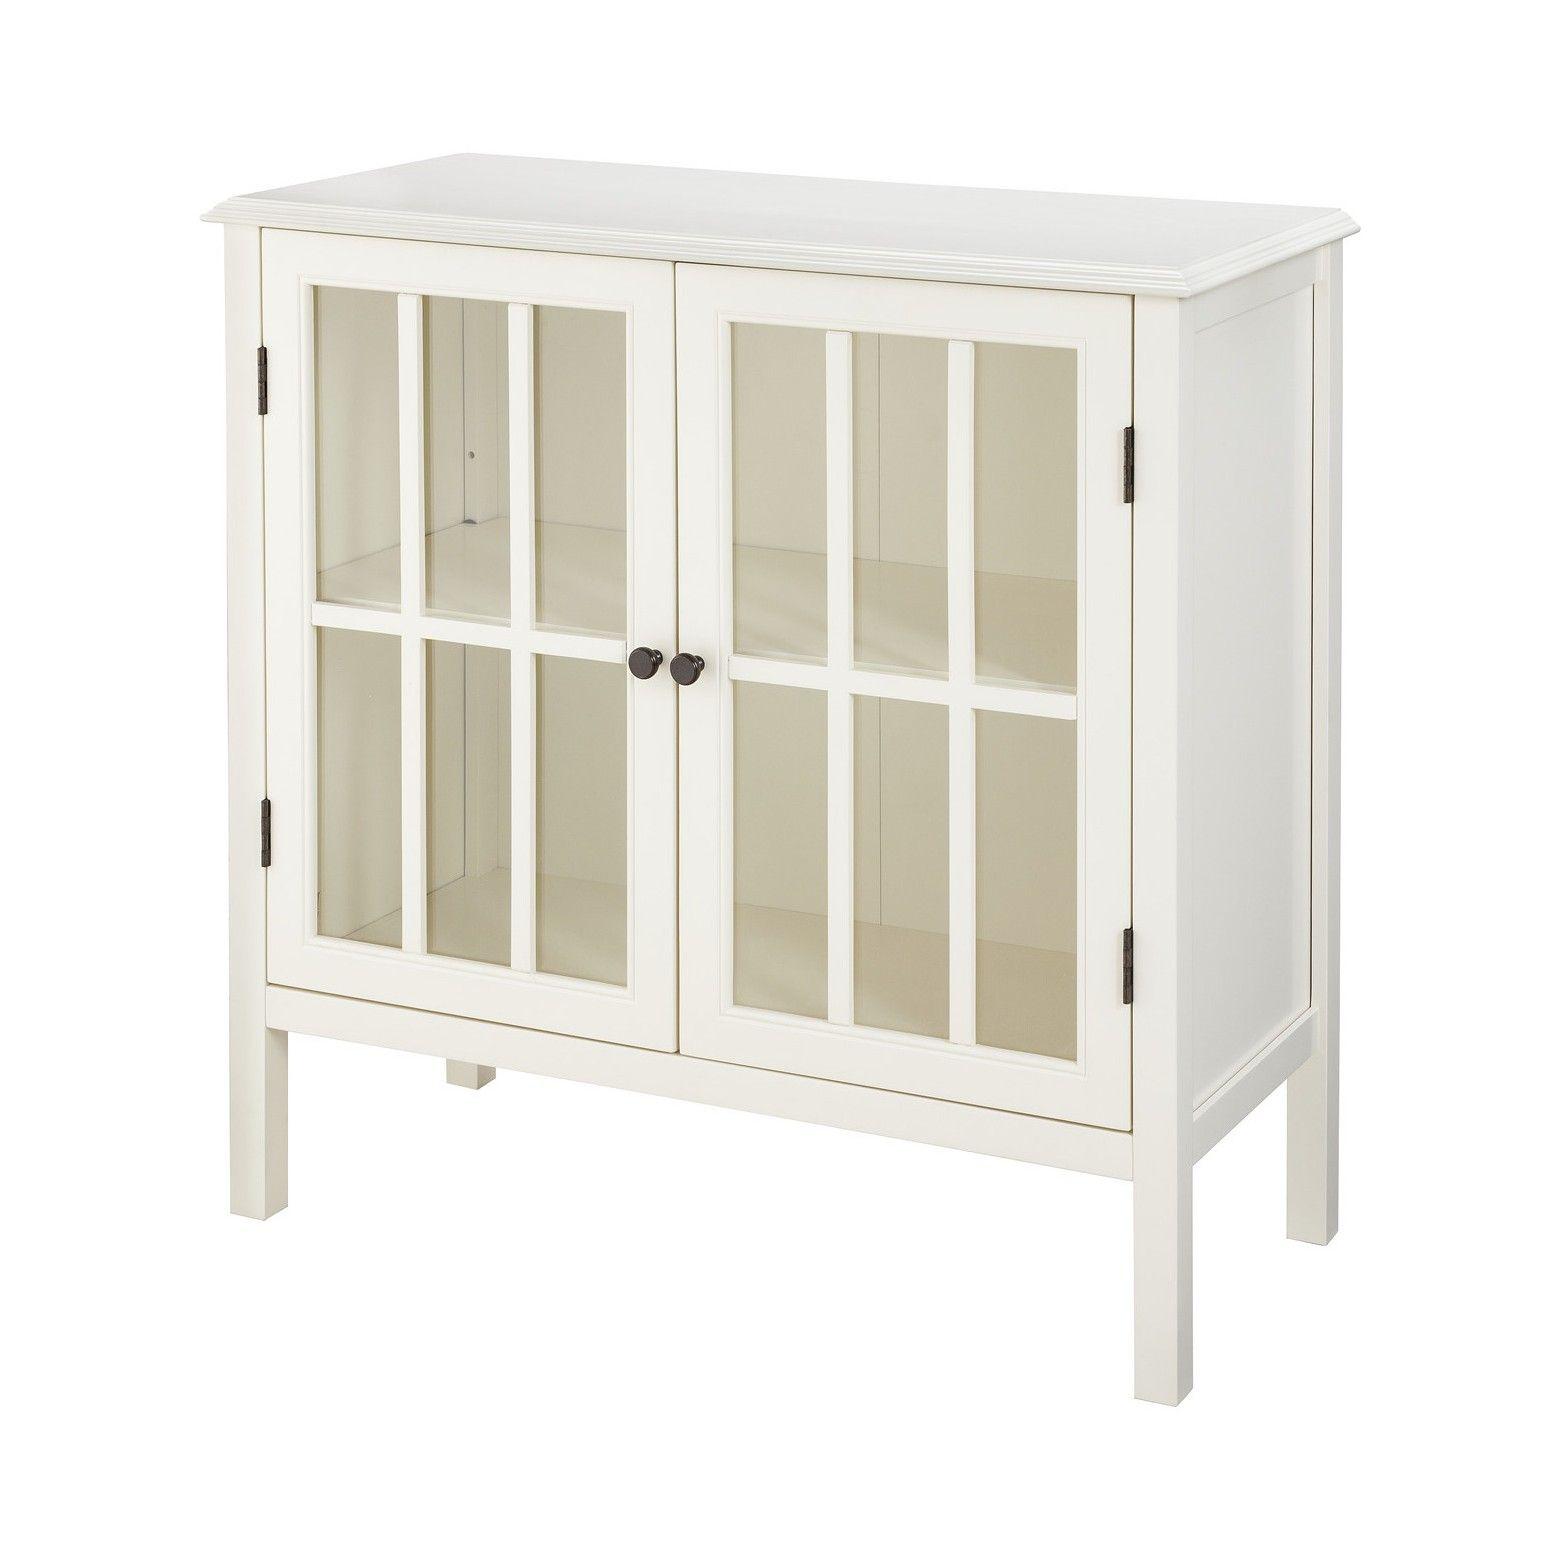 Windham 2 Door Accent Cabinet Threshold Accent Doors Accent Cabinet Storage Cabinet